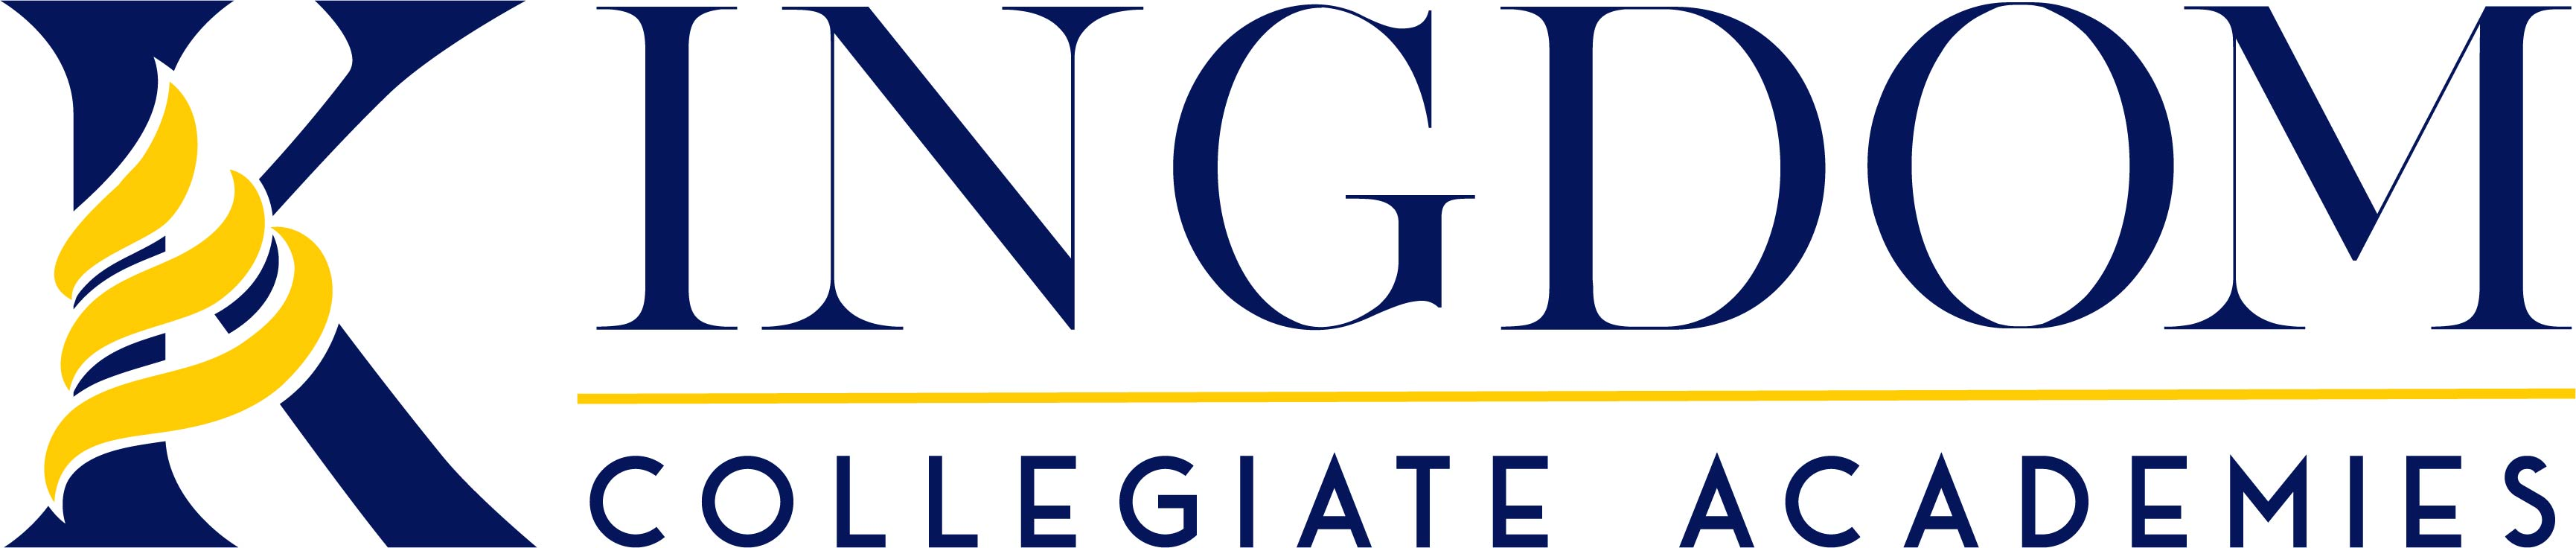 Kingdom C Acad/KCA Logo Final.jpg